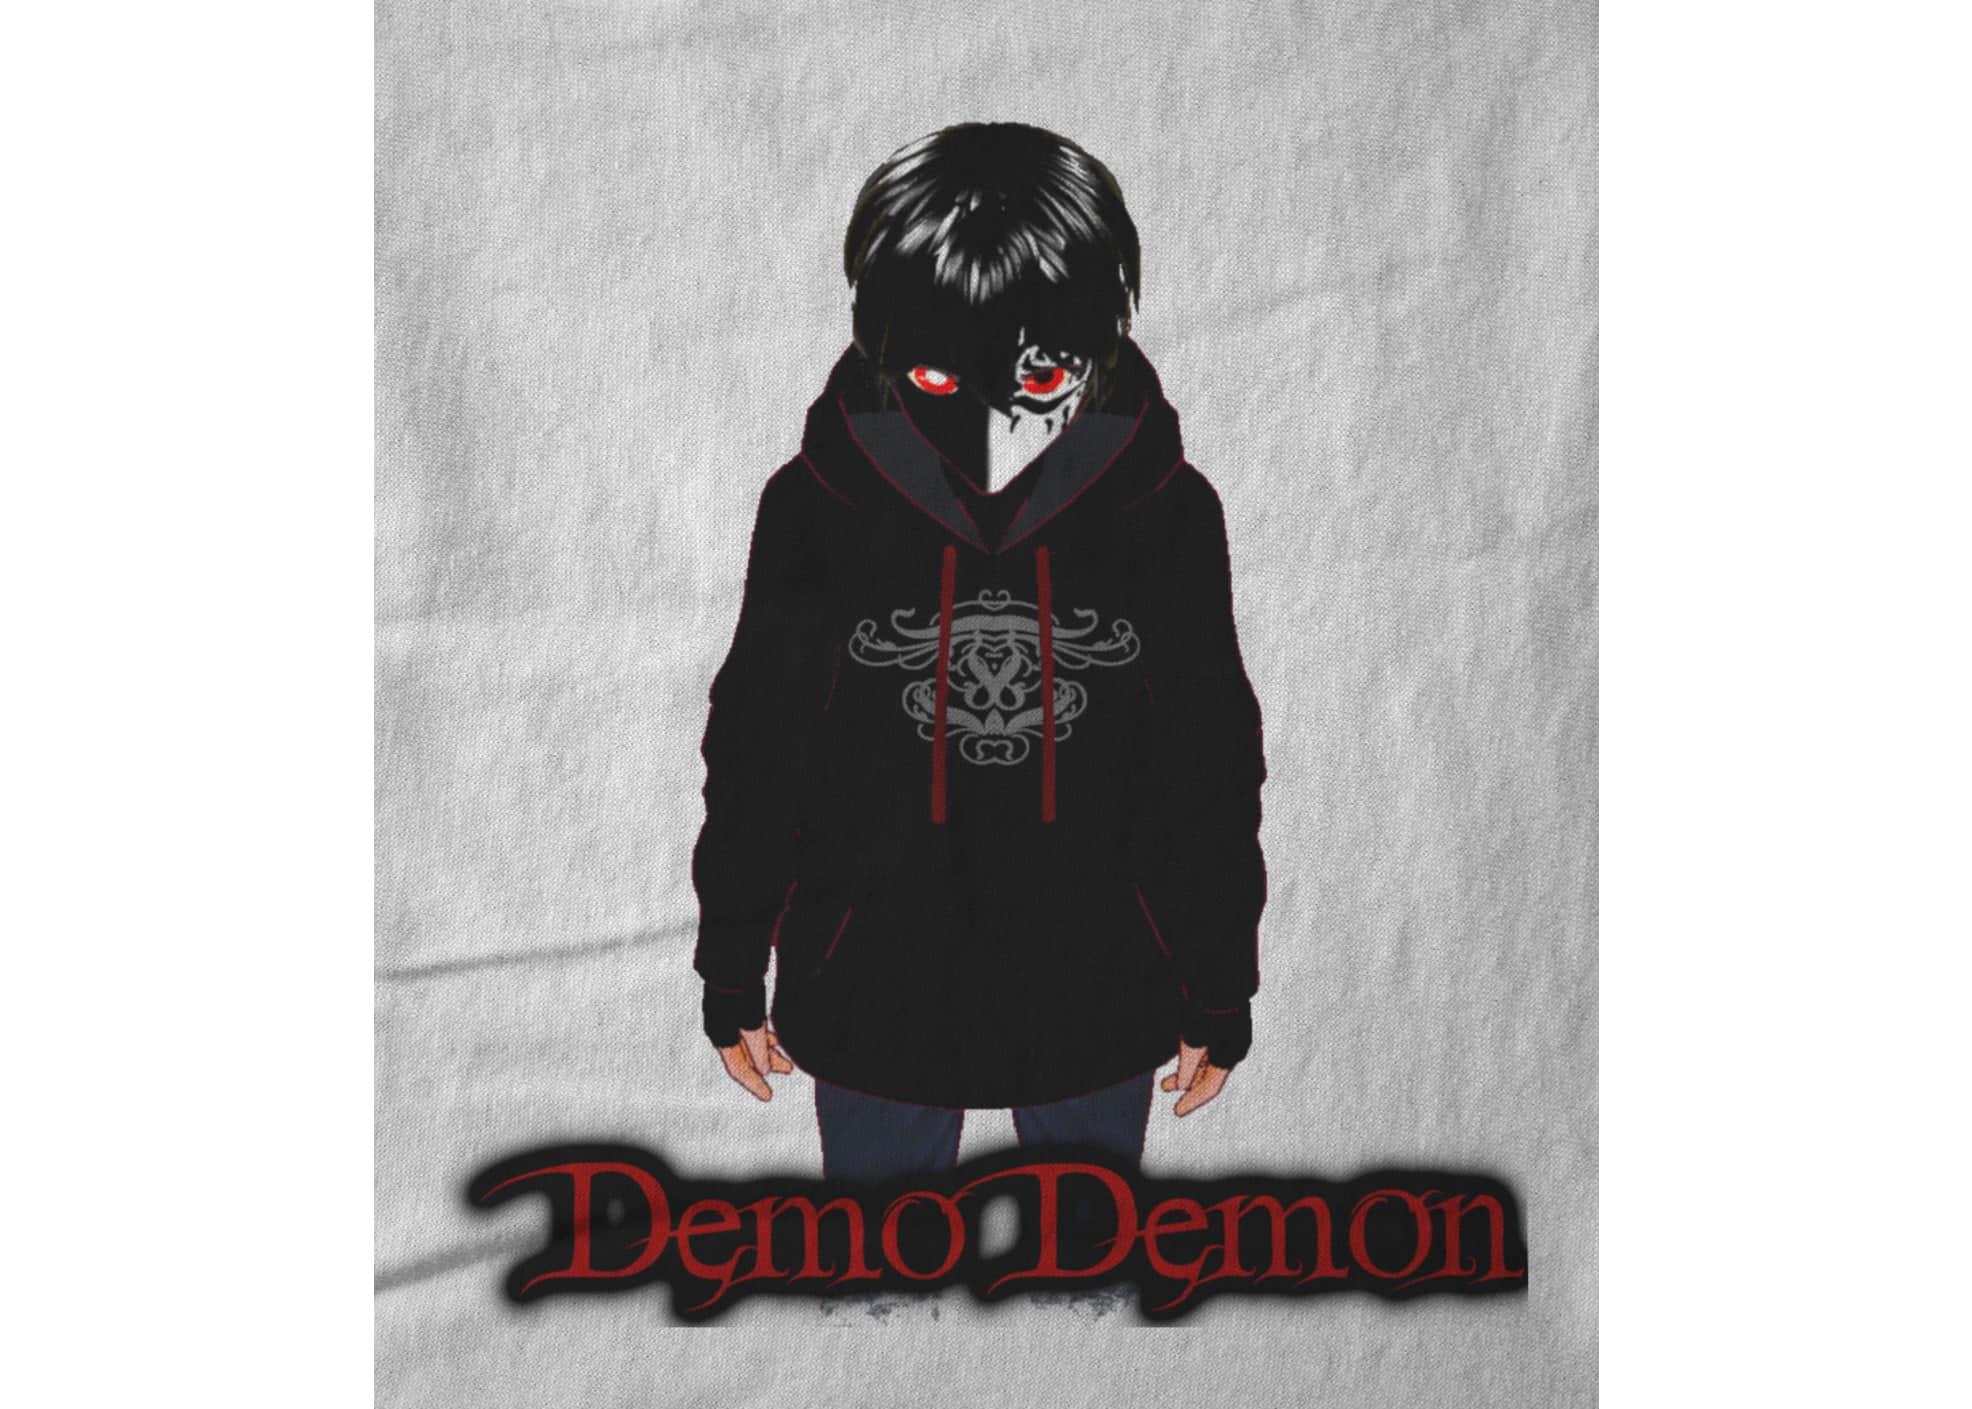 Demo demon protag 1621239950